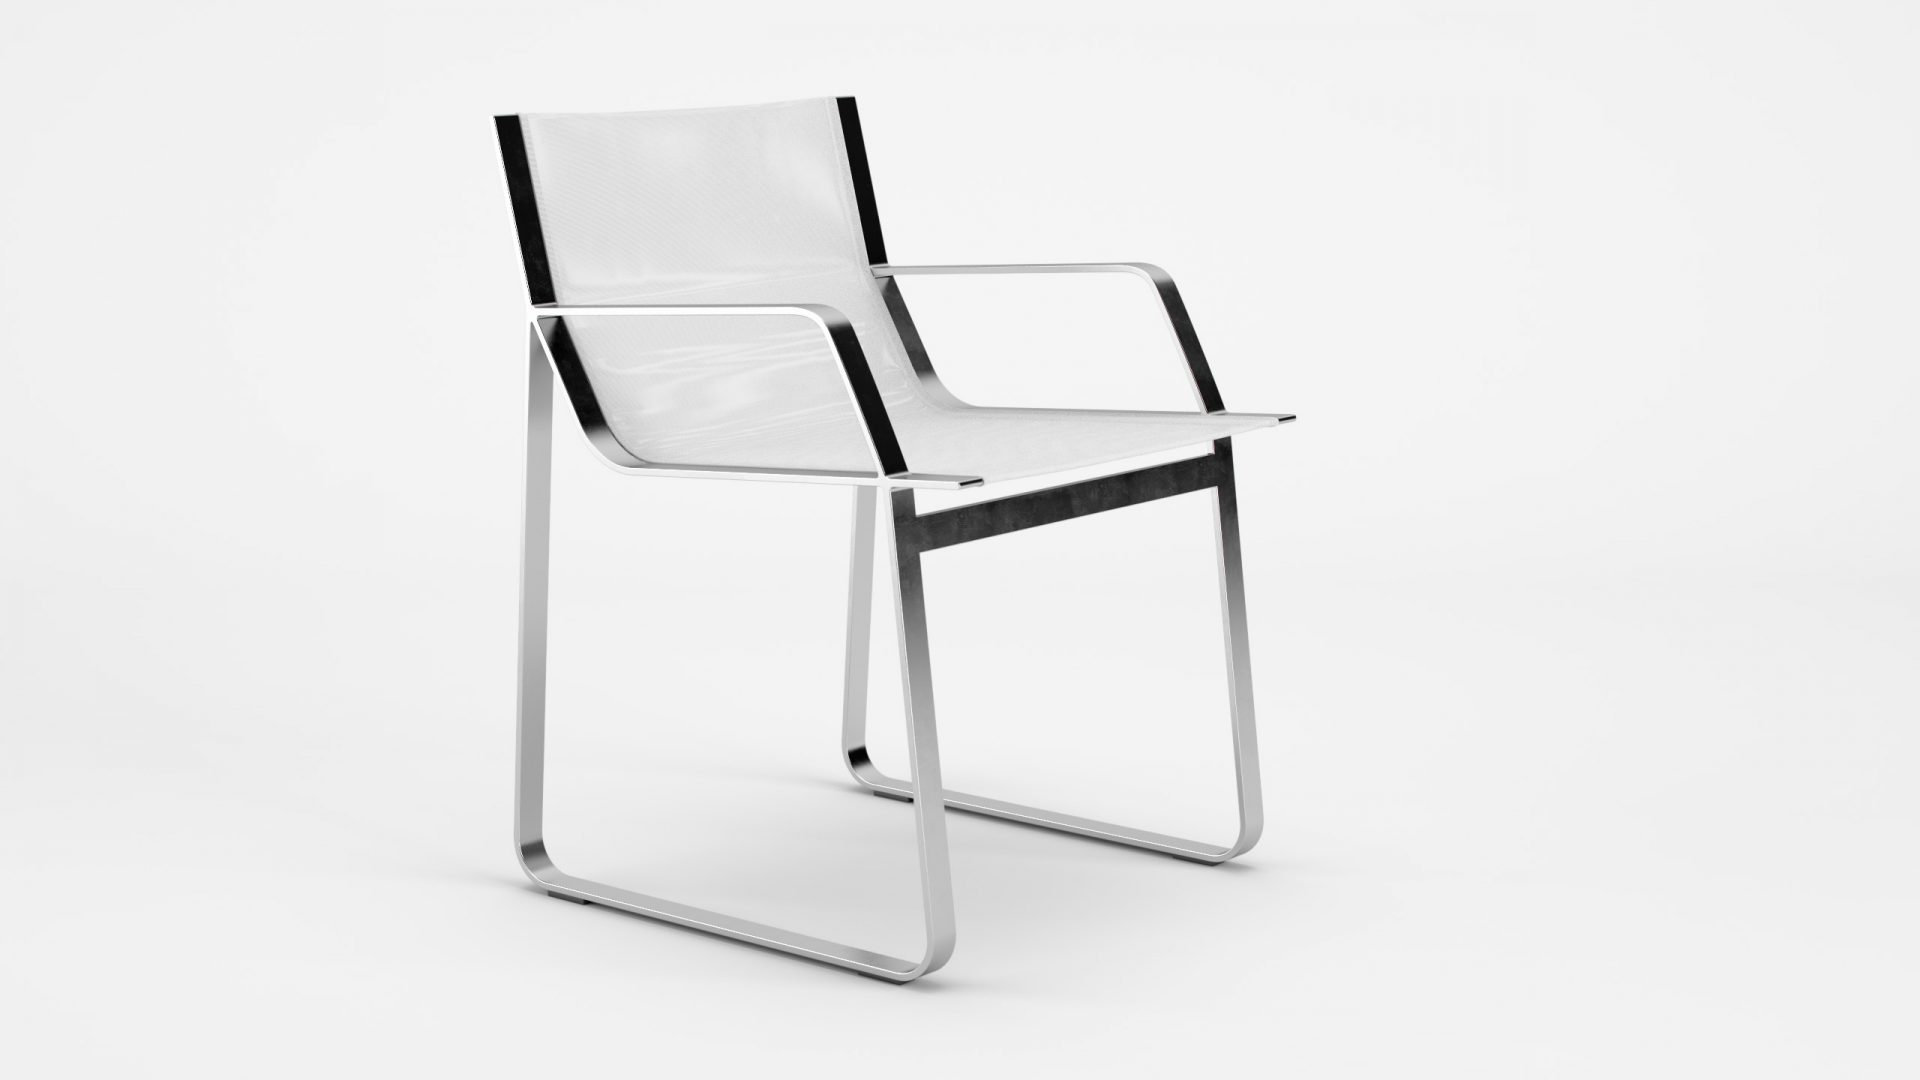 008_Essentiel_Chair_0711E2_WhiteSet_01_0000